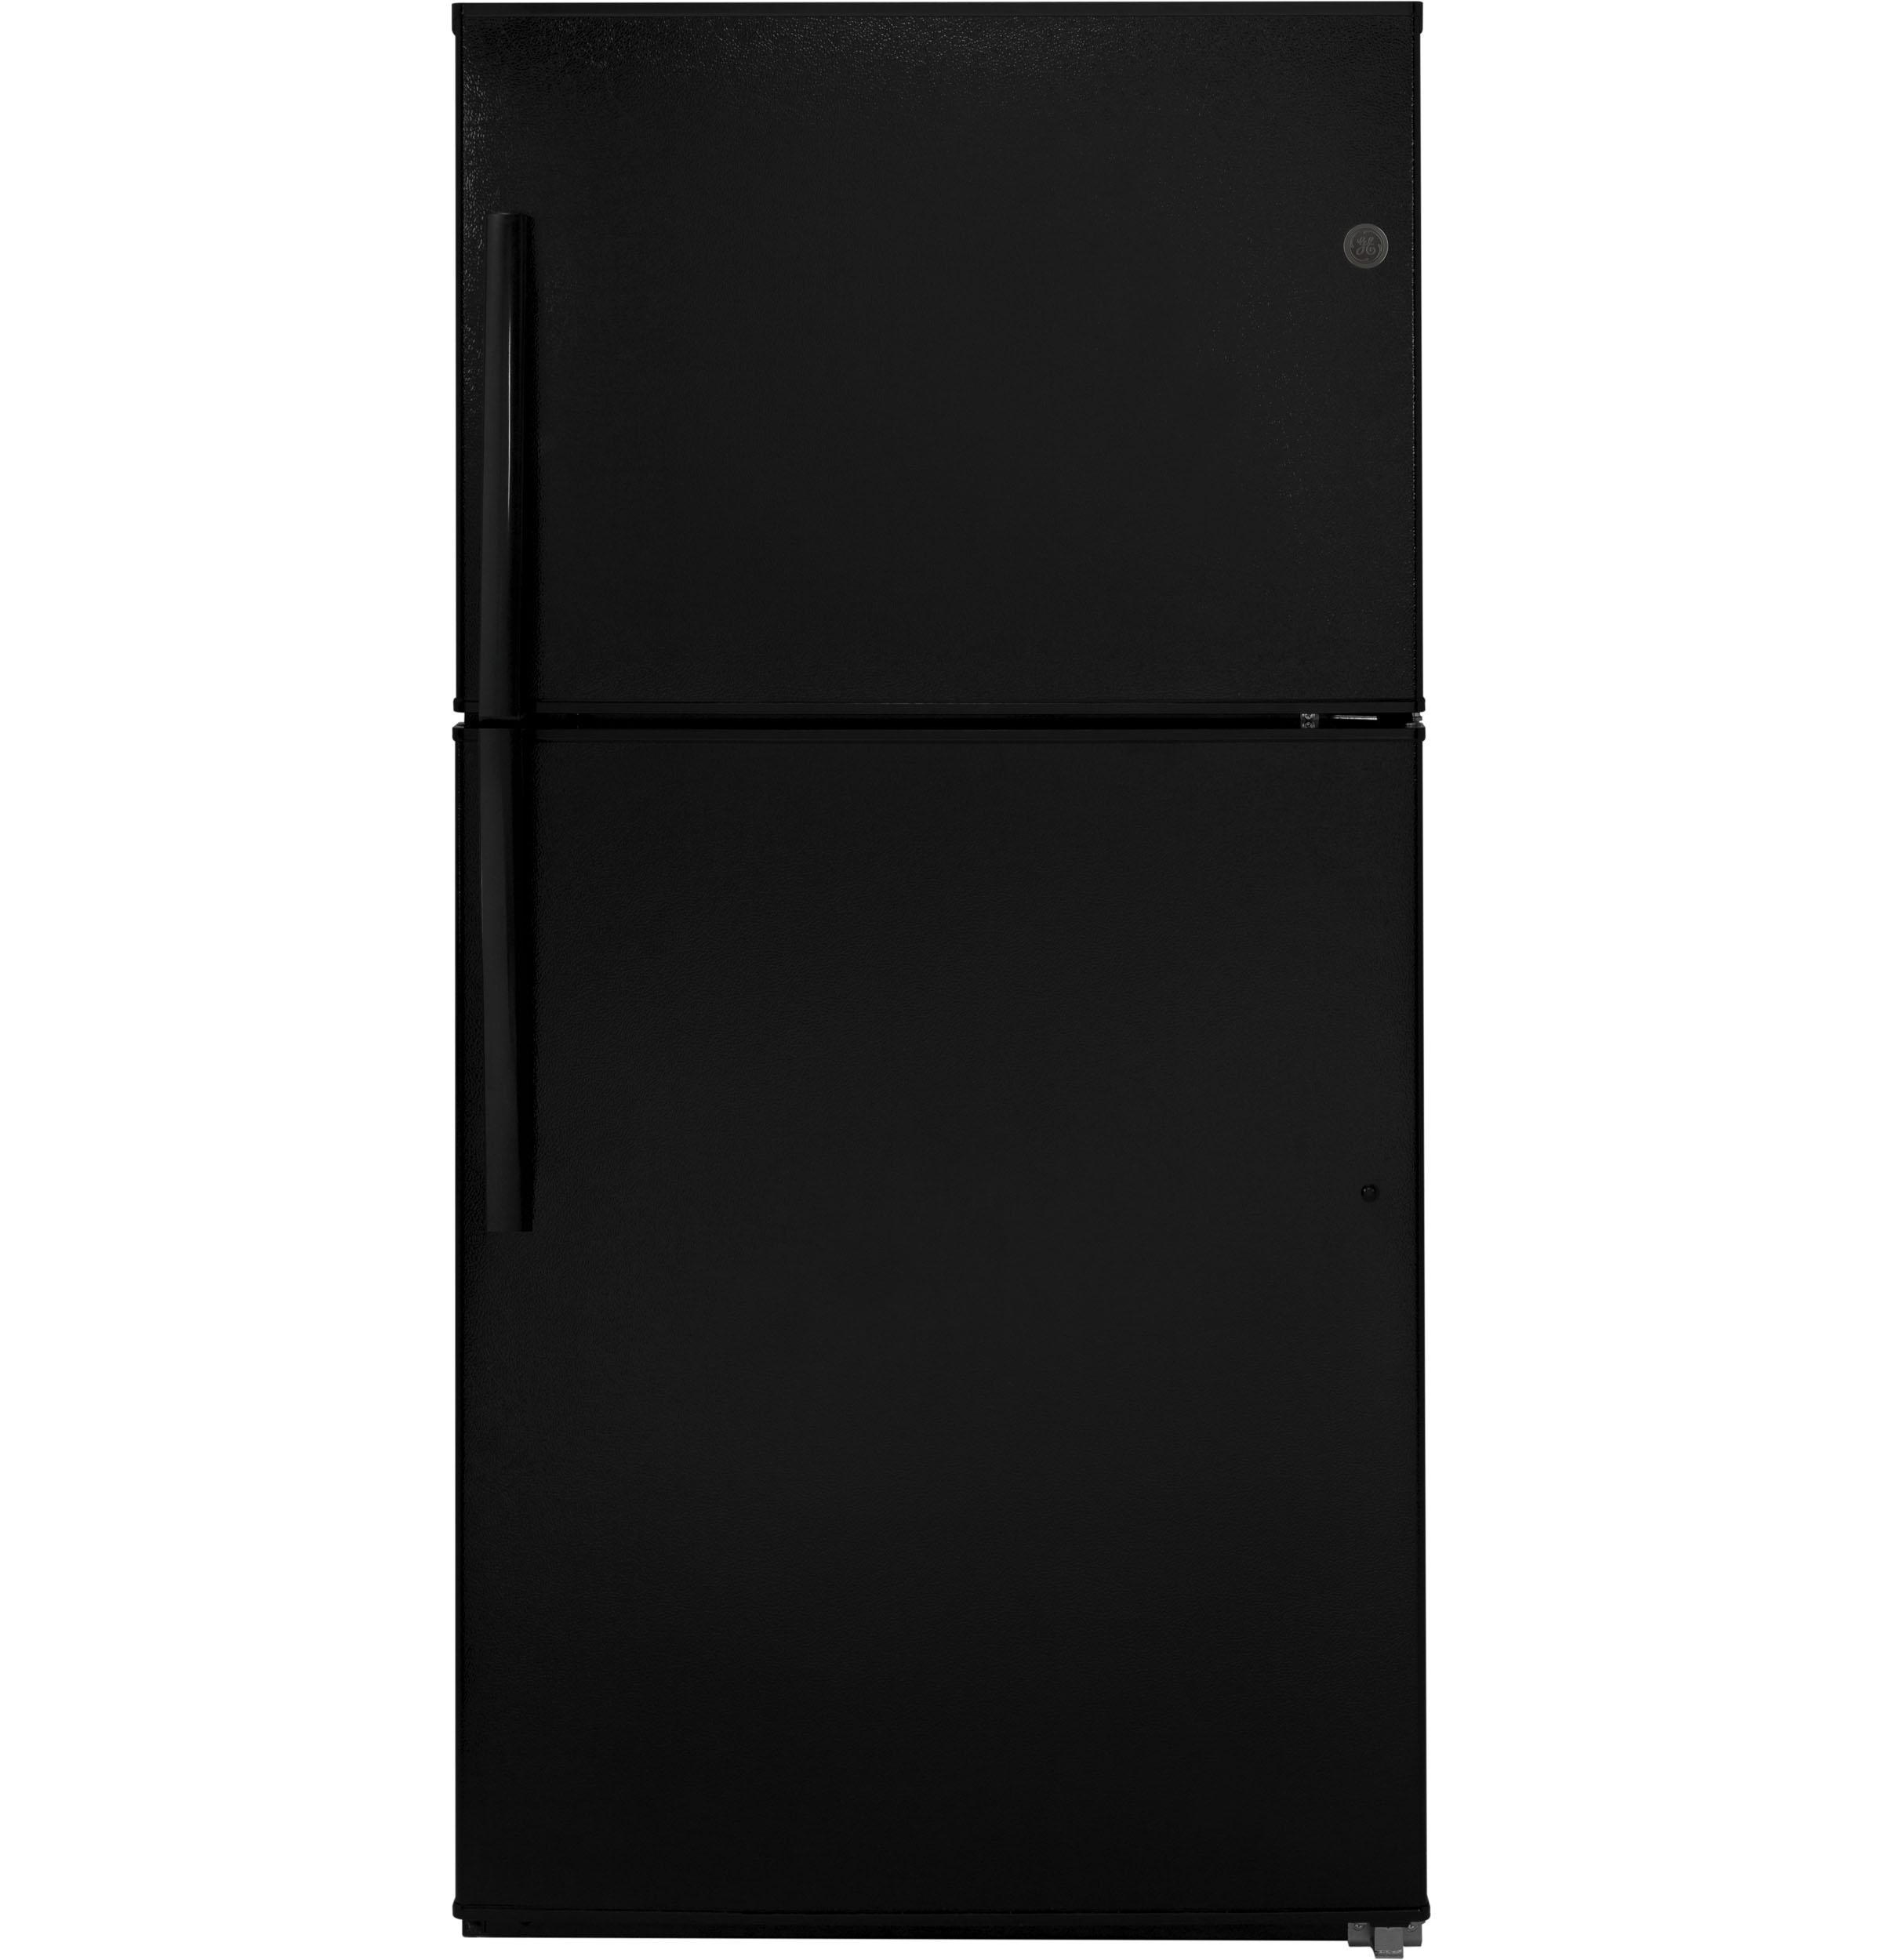 GEEnergy Star® 21.1 Cu. Ft. Top-Freezer Refrigerator